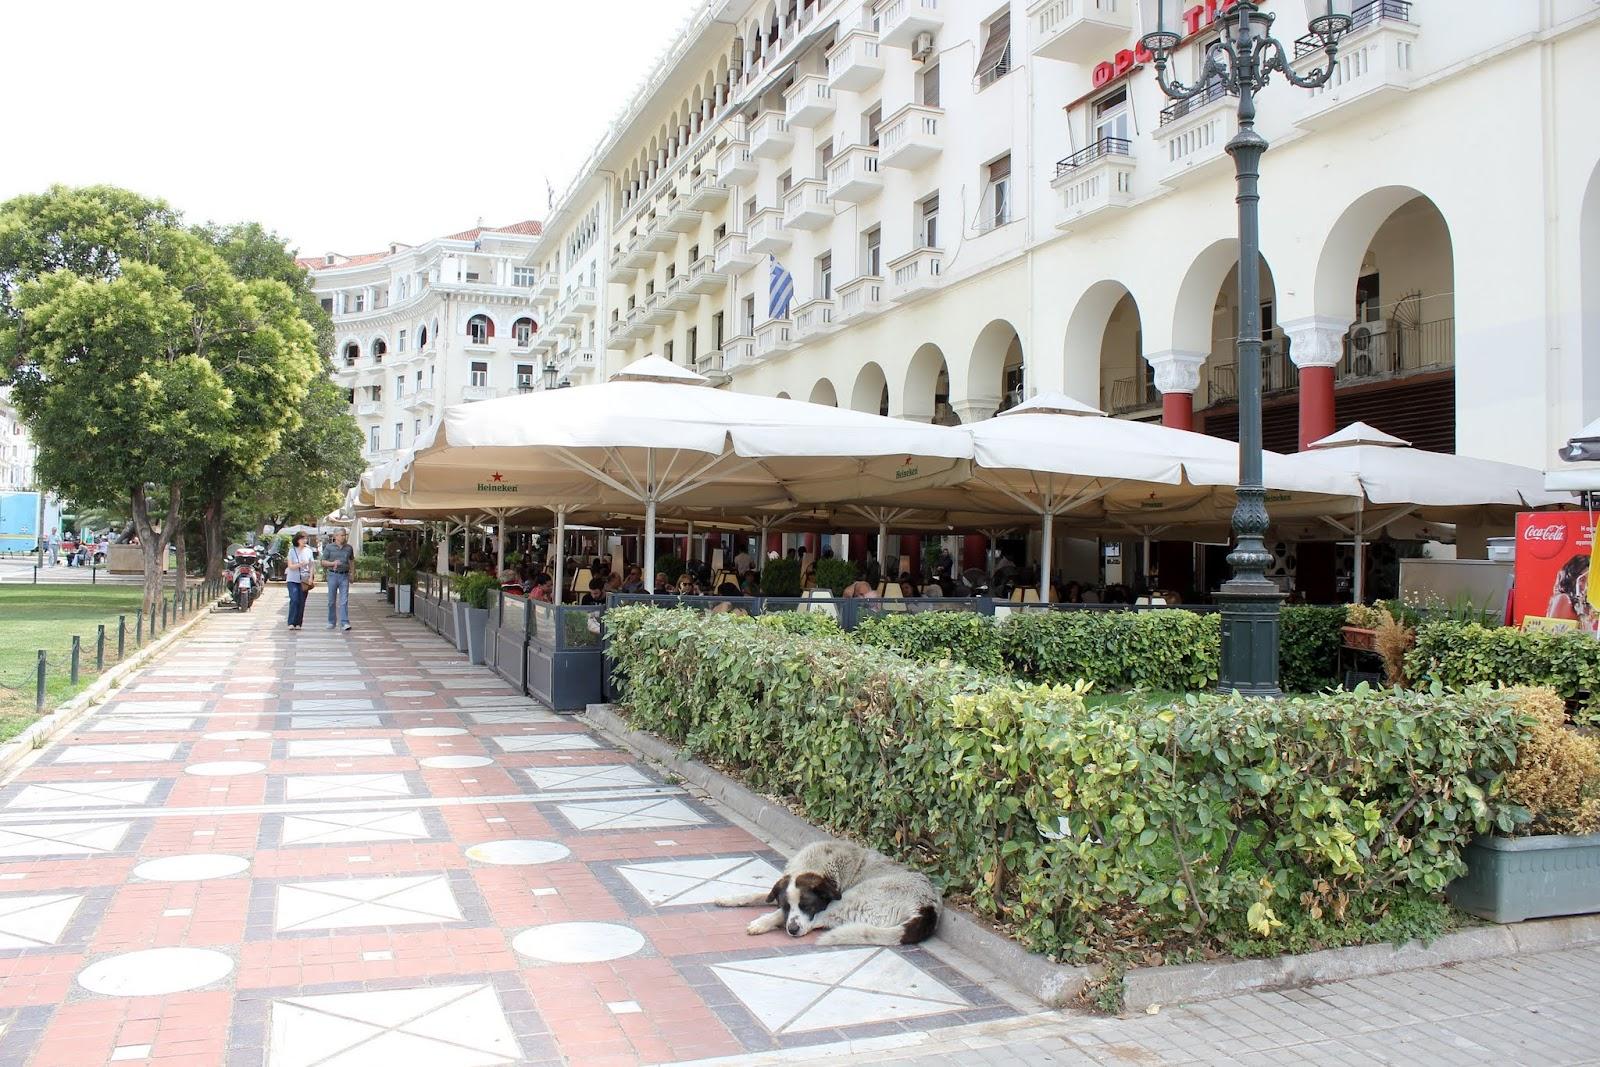 Day 19 - 2013-06-12 - Thessaloniki - IMG_0273.JPG